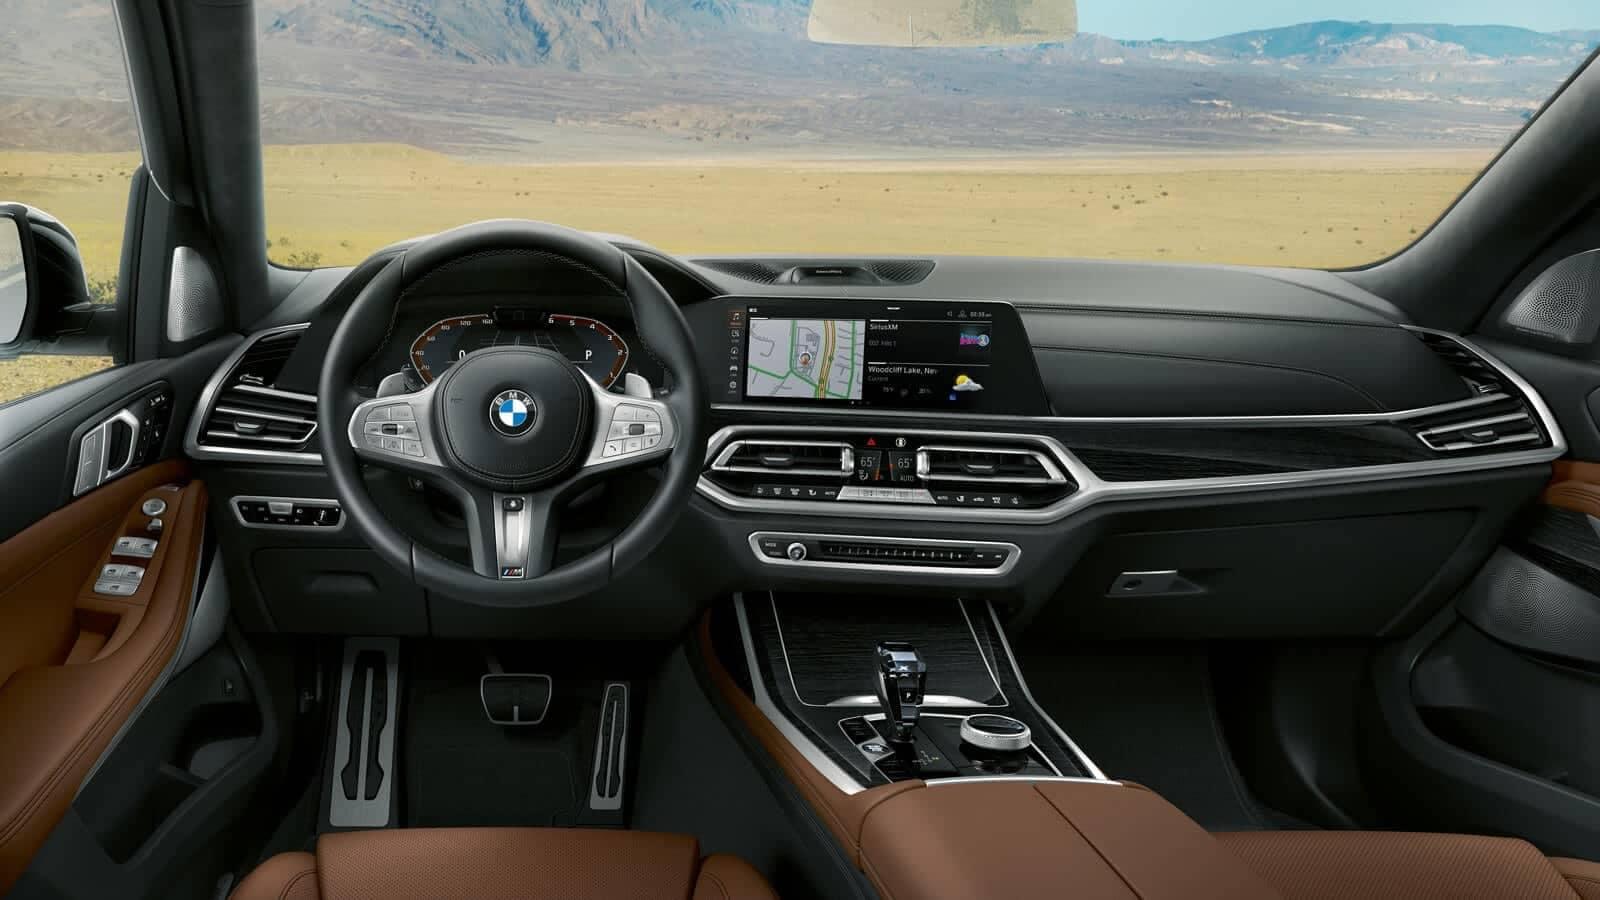 BMW X7 interior dashboard